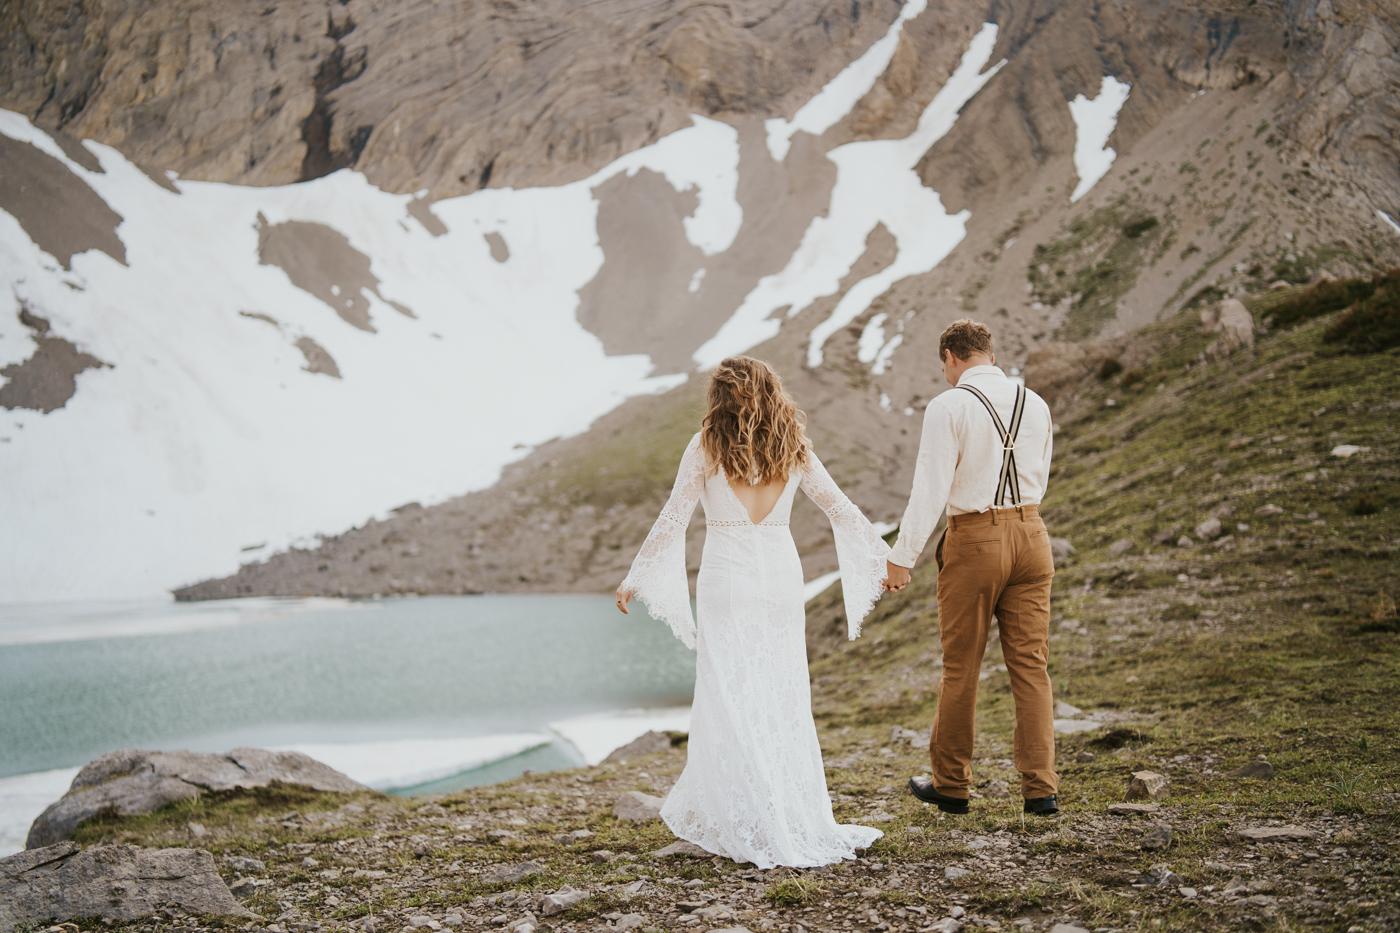 tyraephotography_photographer_wedding_elopement_engagement_photography-07550.jpg